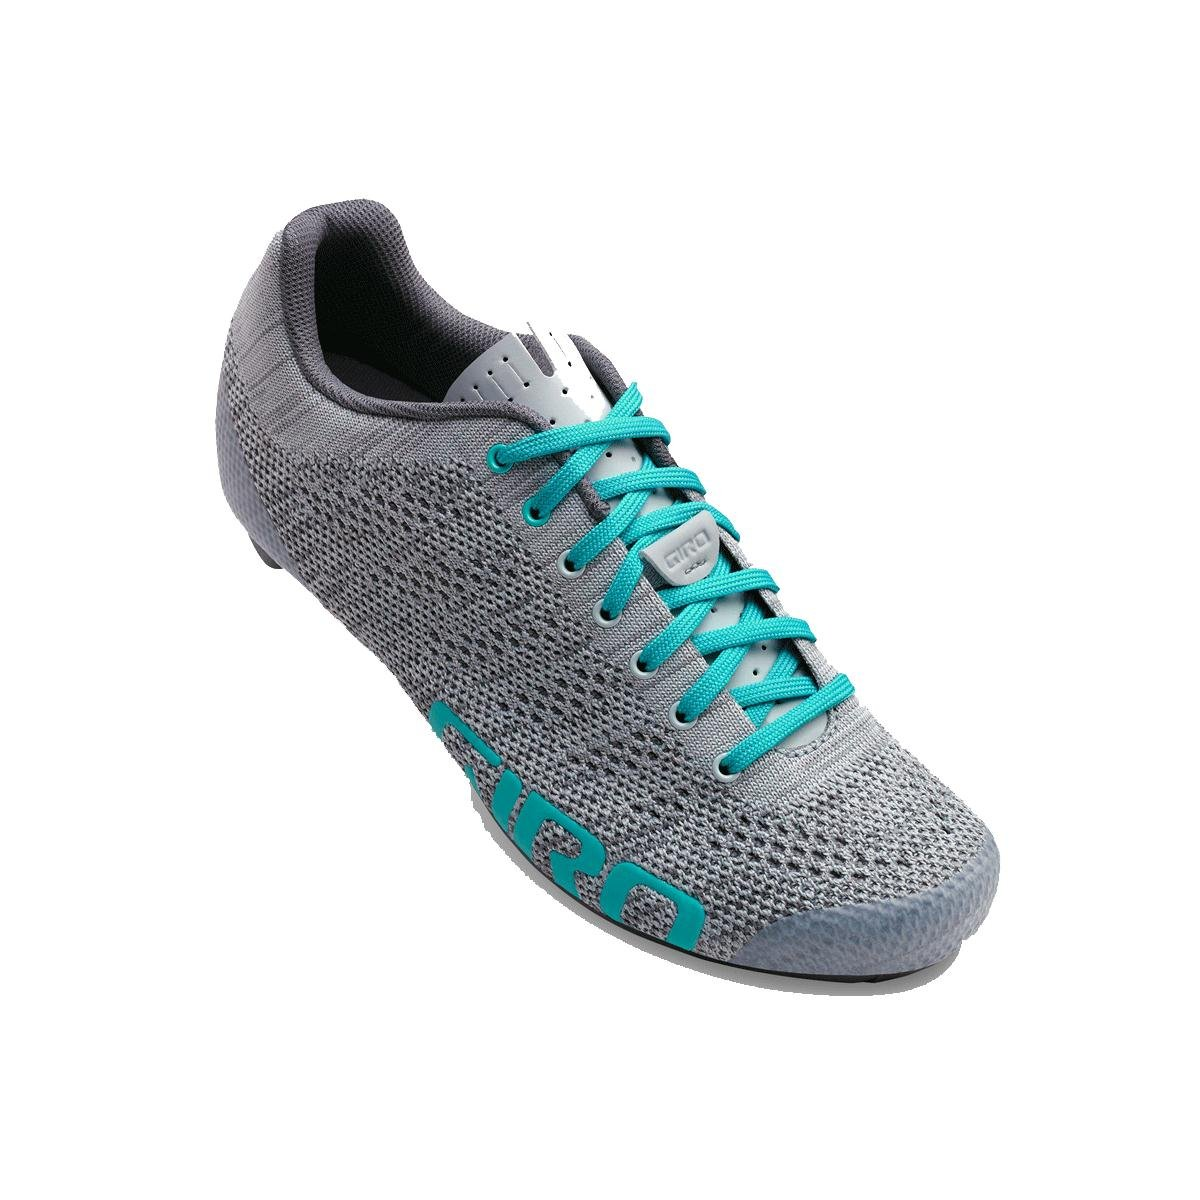 Giro Empire E70 Knit Road, Chaussures de Vélo de Route Femme Chaussures de Vélo de Route Femme